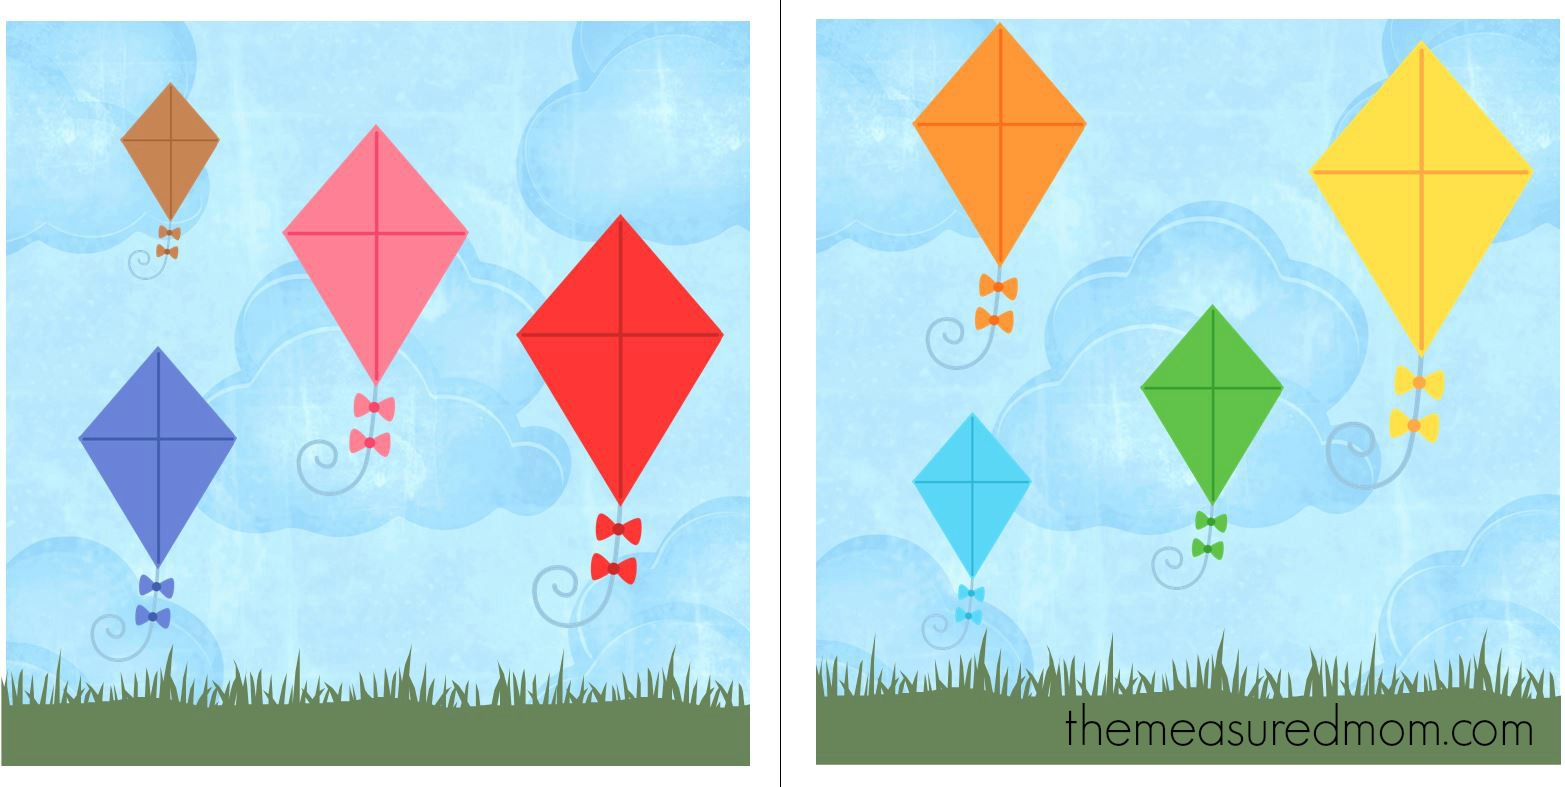 Free File Folder Game For Preschoolers: Kites! - The Measured Mom - Free Printable File Folder Games